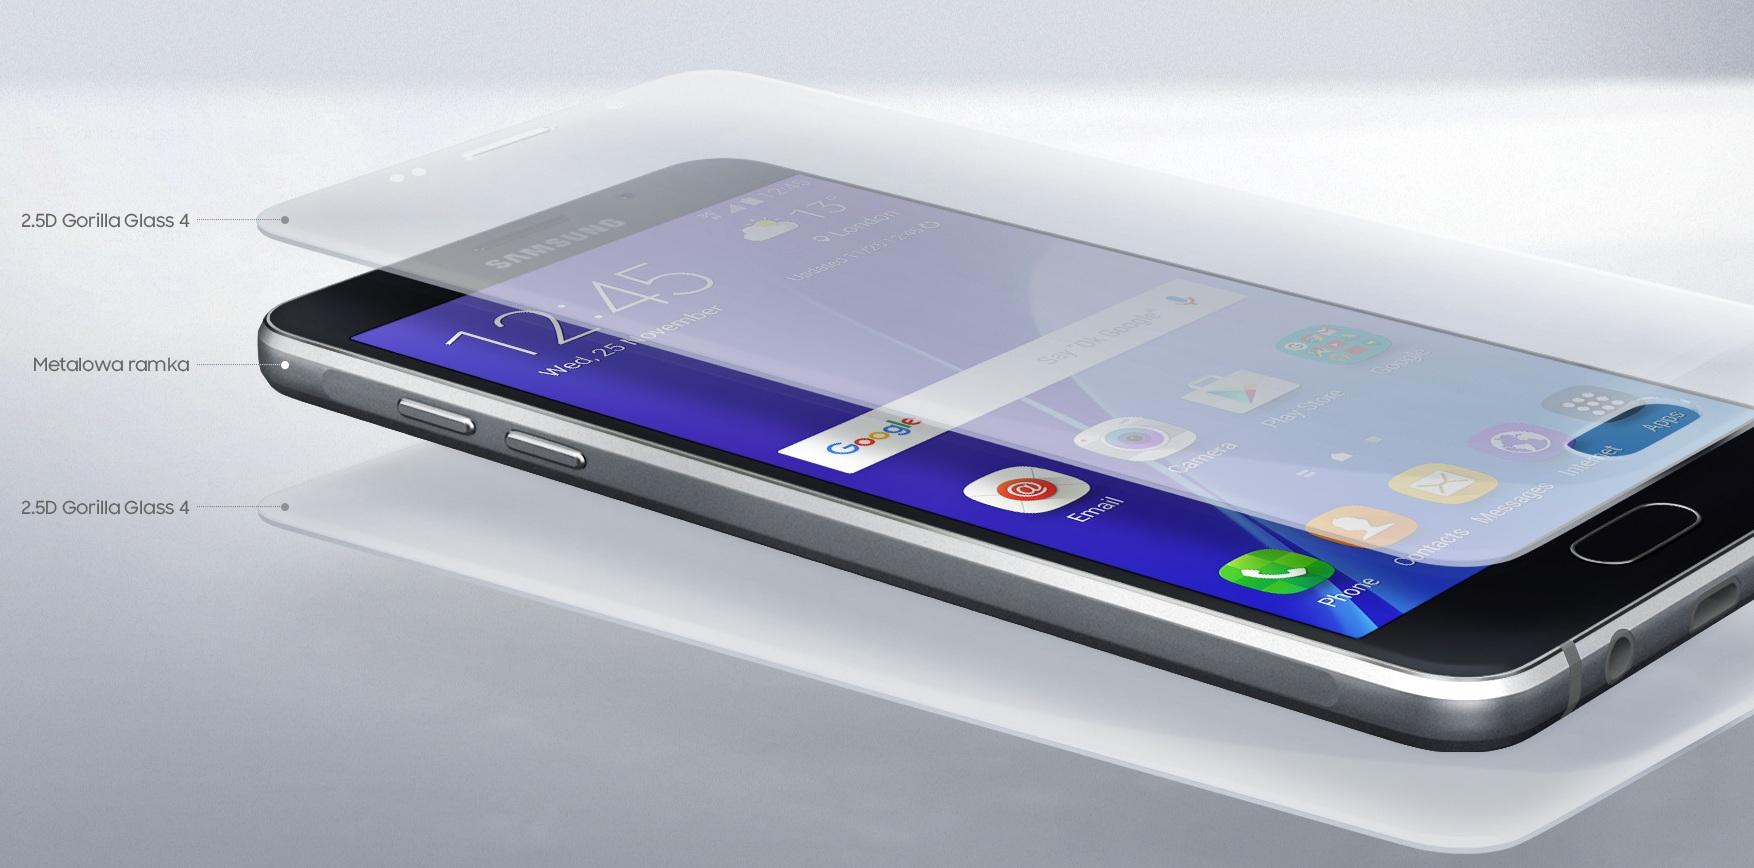 Samsung Galaxy A5 2016 Gorilla Glass